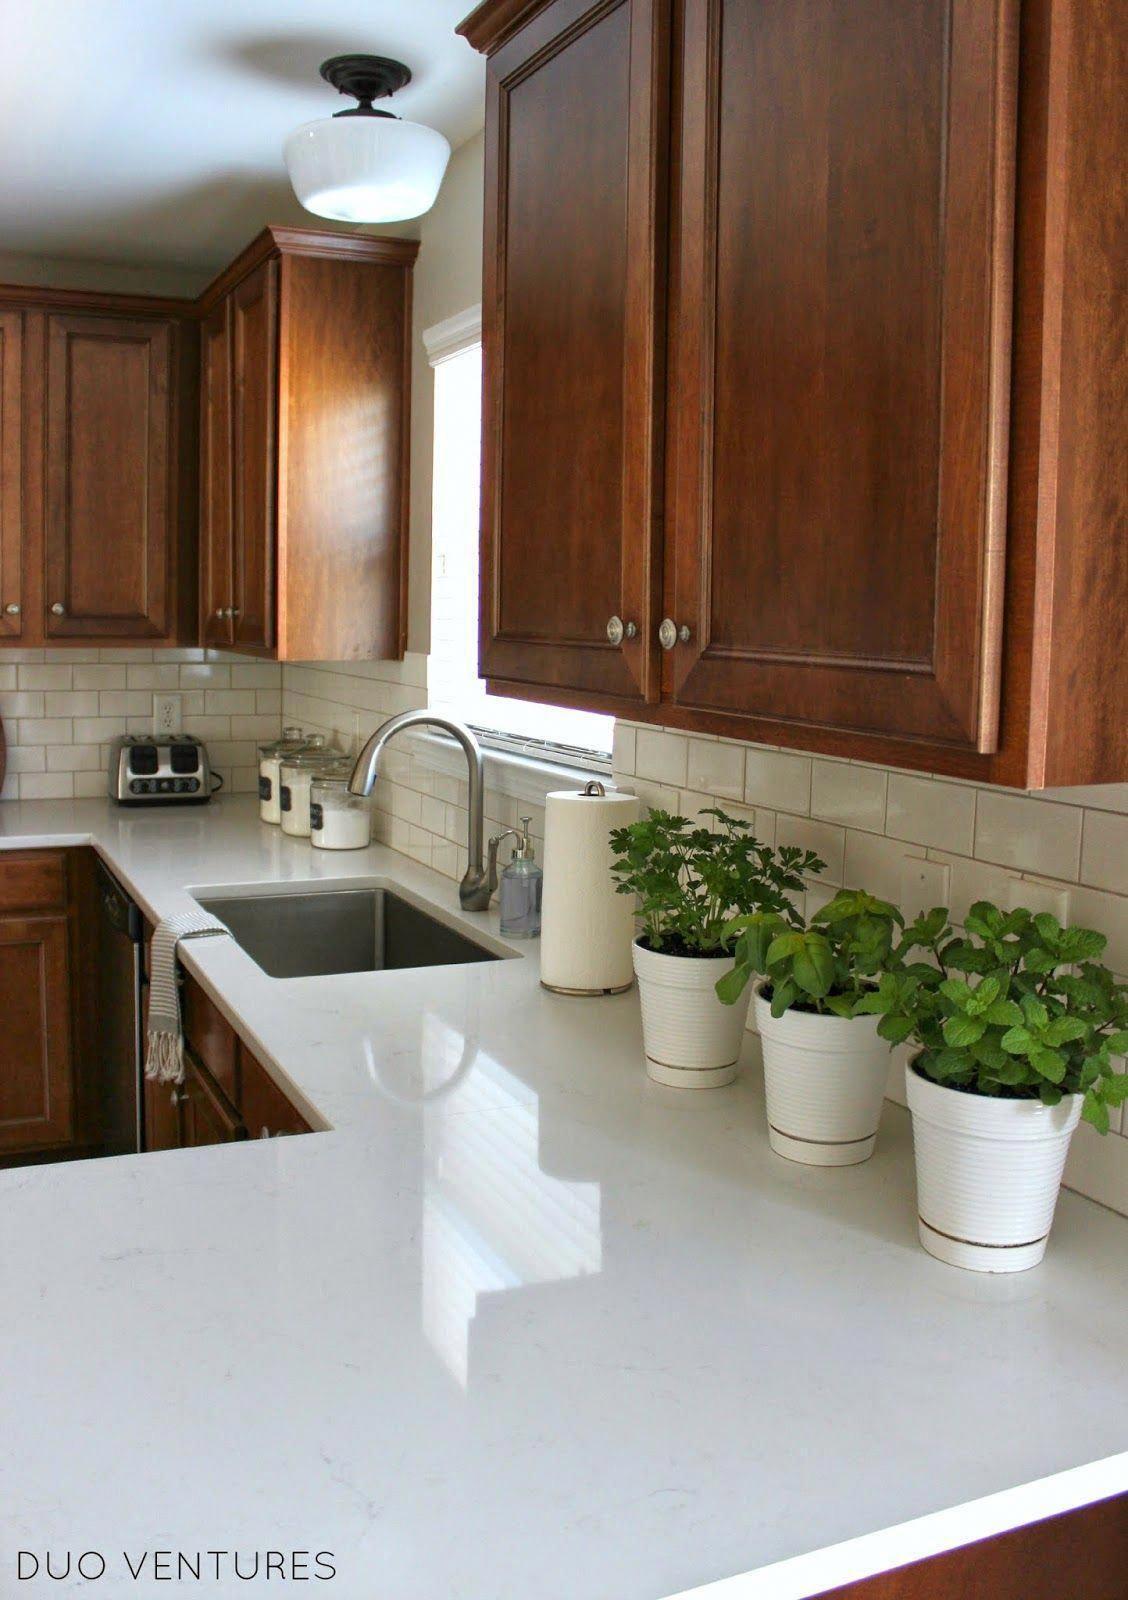 Duo Ventures Kitchen Makeover Final Reveal Kitchencountertopsquarts Kitchenremodeling Medium Wood Kitchen Cabinets Kitchen Renovation New Kitchen Cabinets